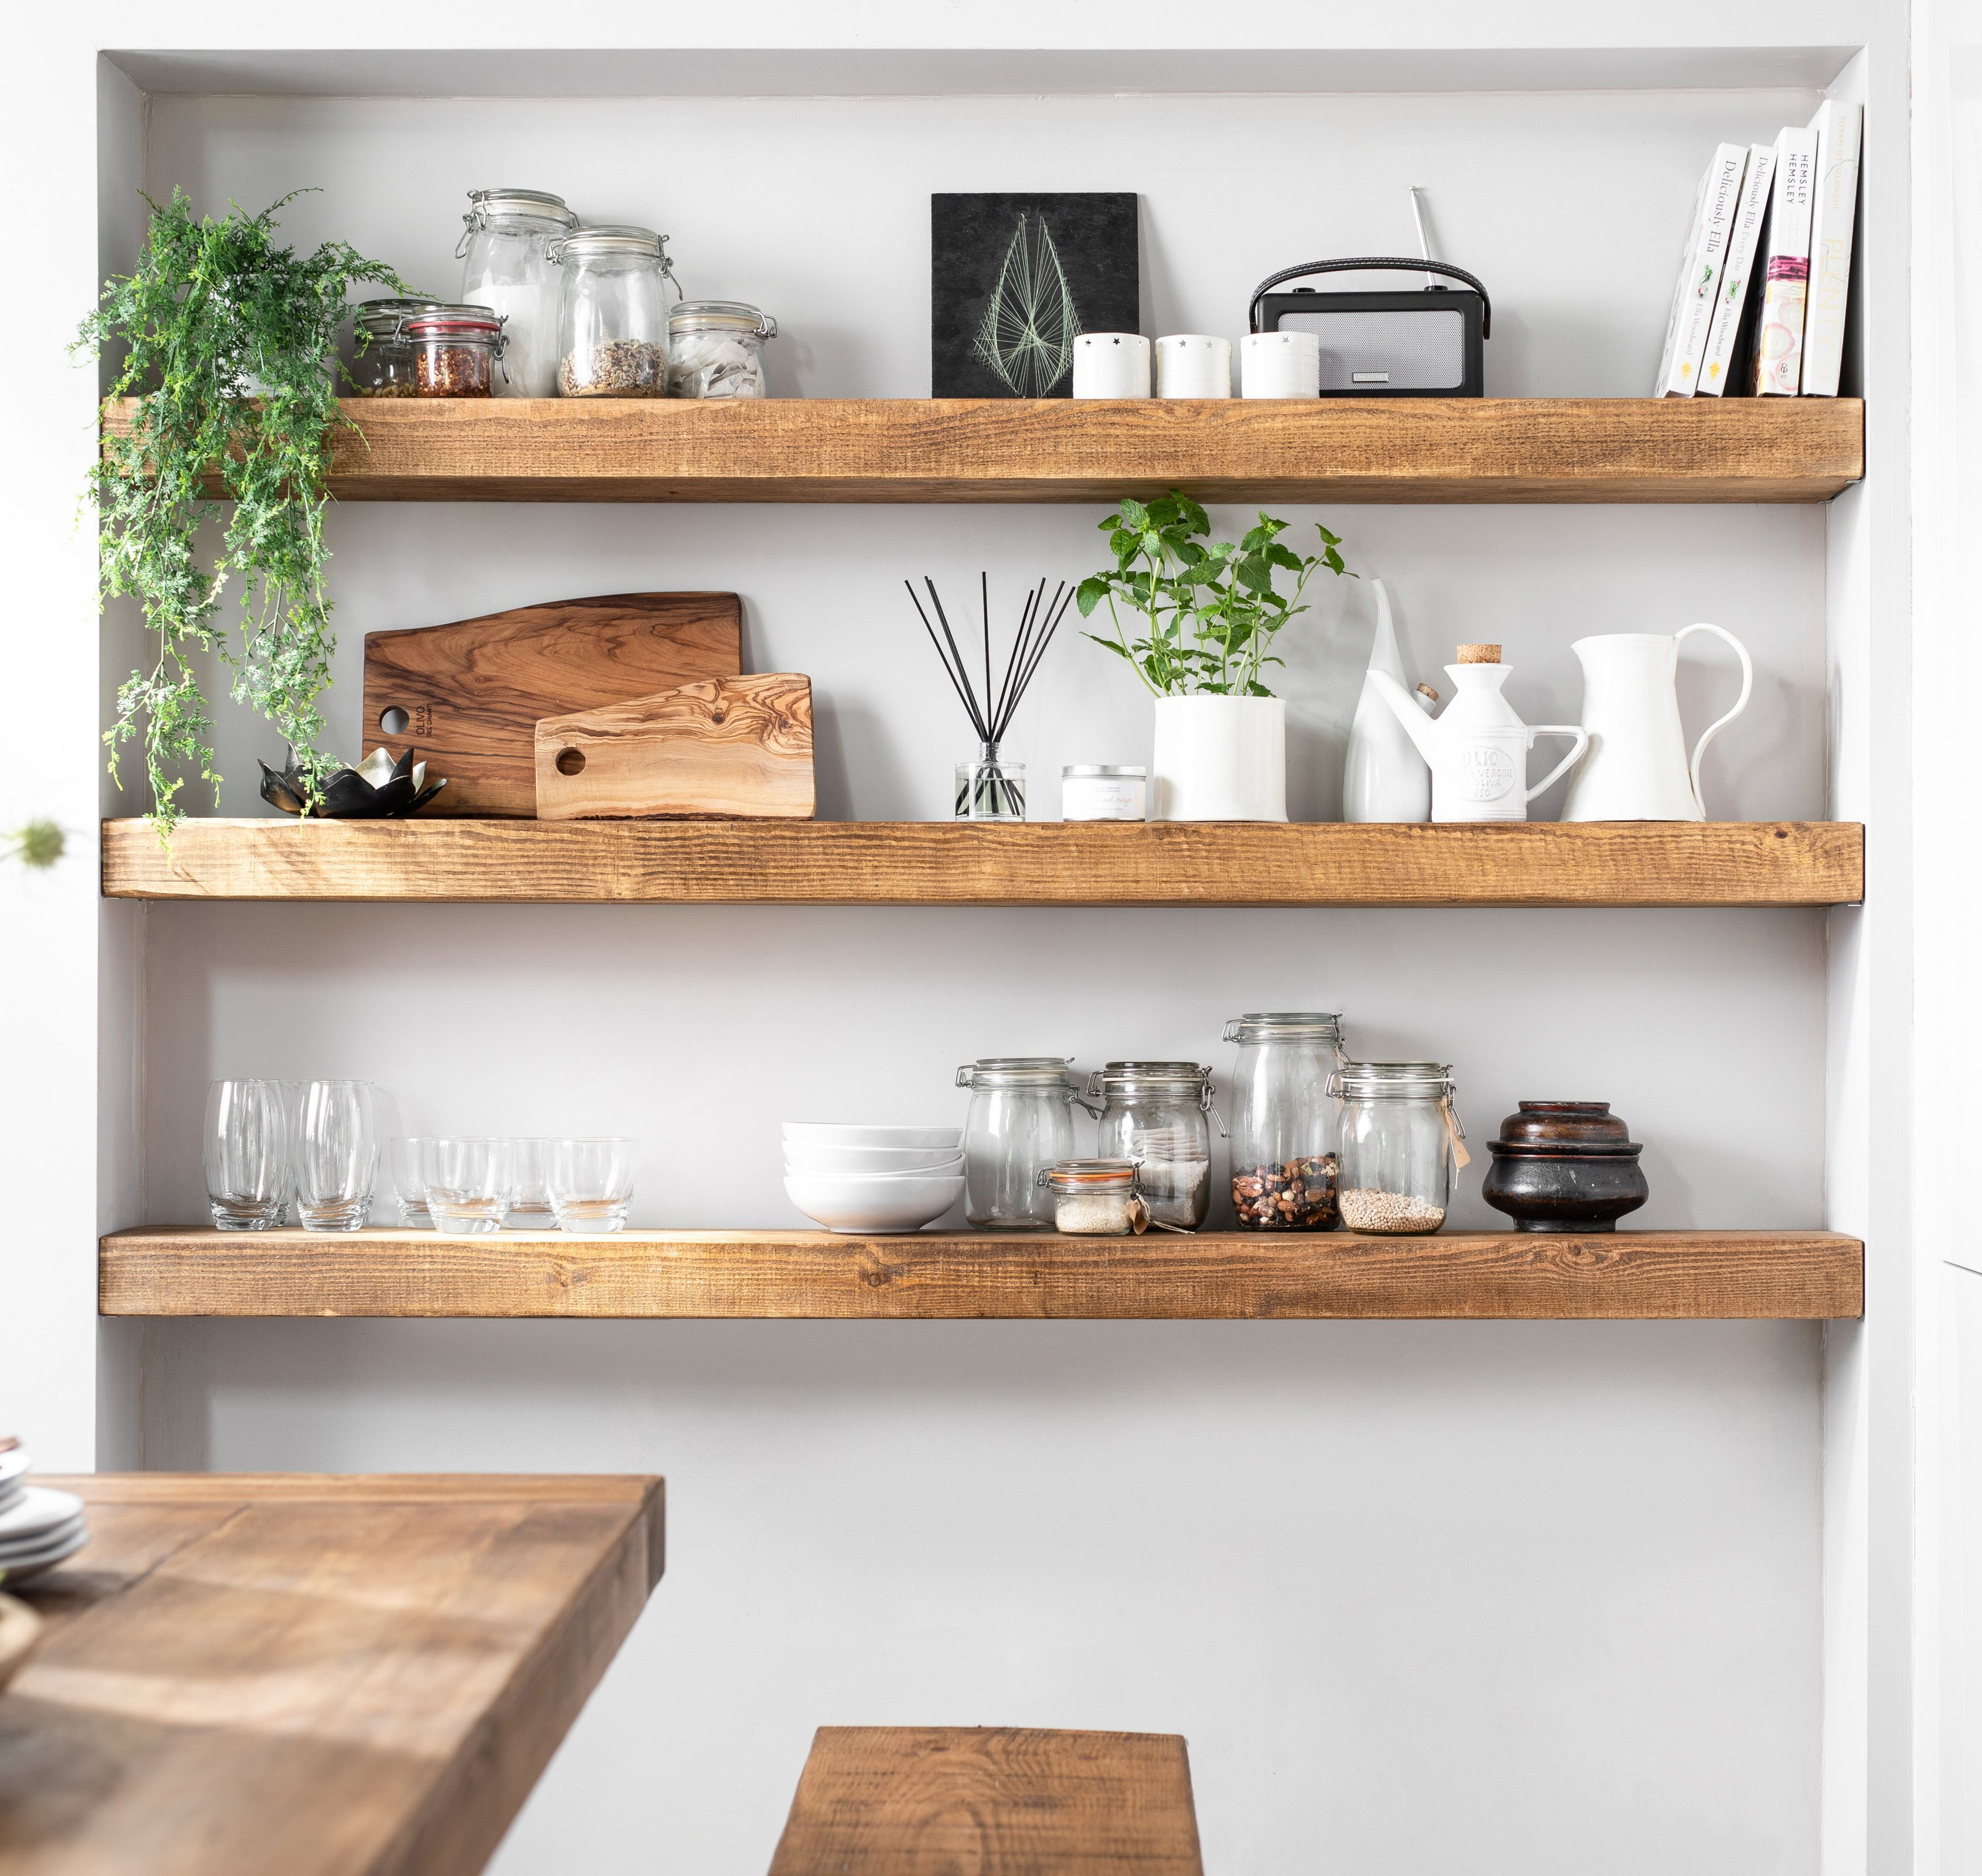 Statement Kitchen Storage Chunky Floating Solid Wood Shelves Floatingshelves In 2020 Massive Holzregale Regal Eiche Innenarchitektur Kuche